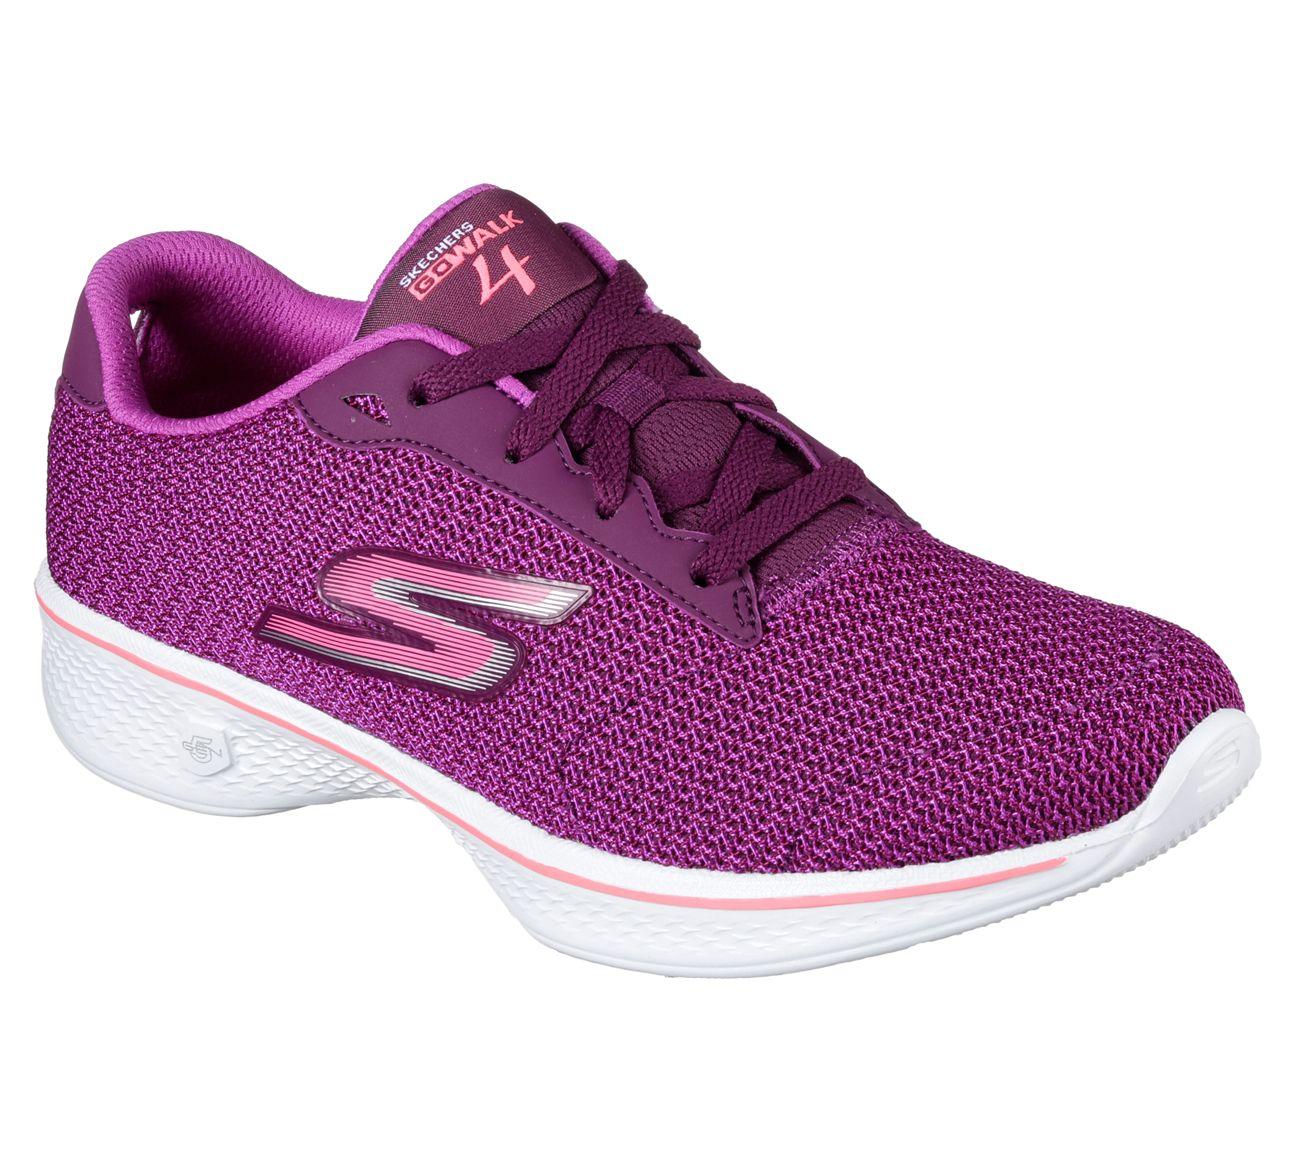 Preservativo restante Escrupuloso  GOwalk 4 - Glorify | Skechers, Shoes, Sketchers shoes